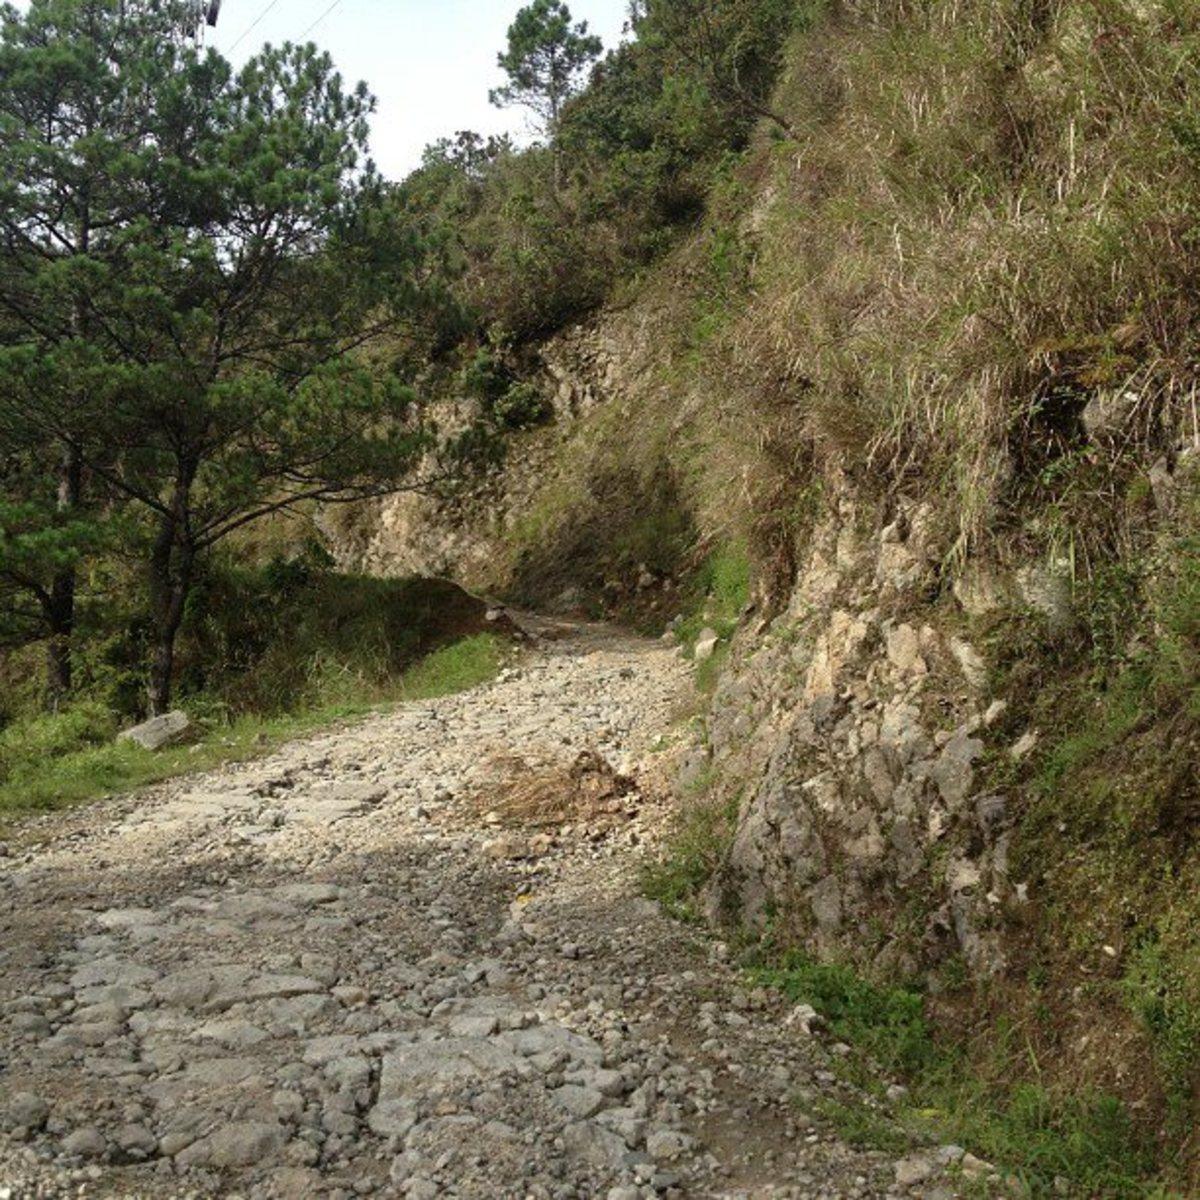 On the climb, 4